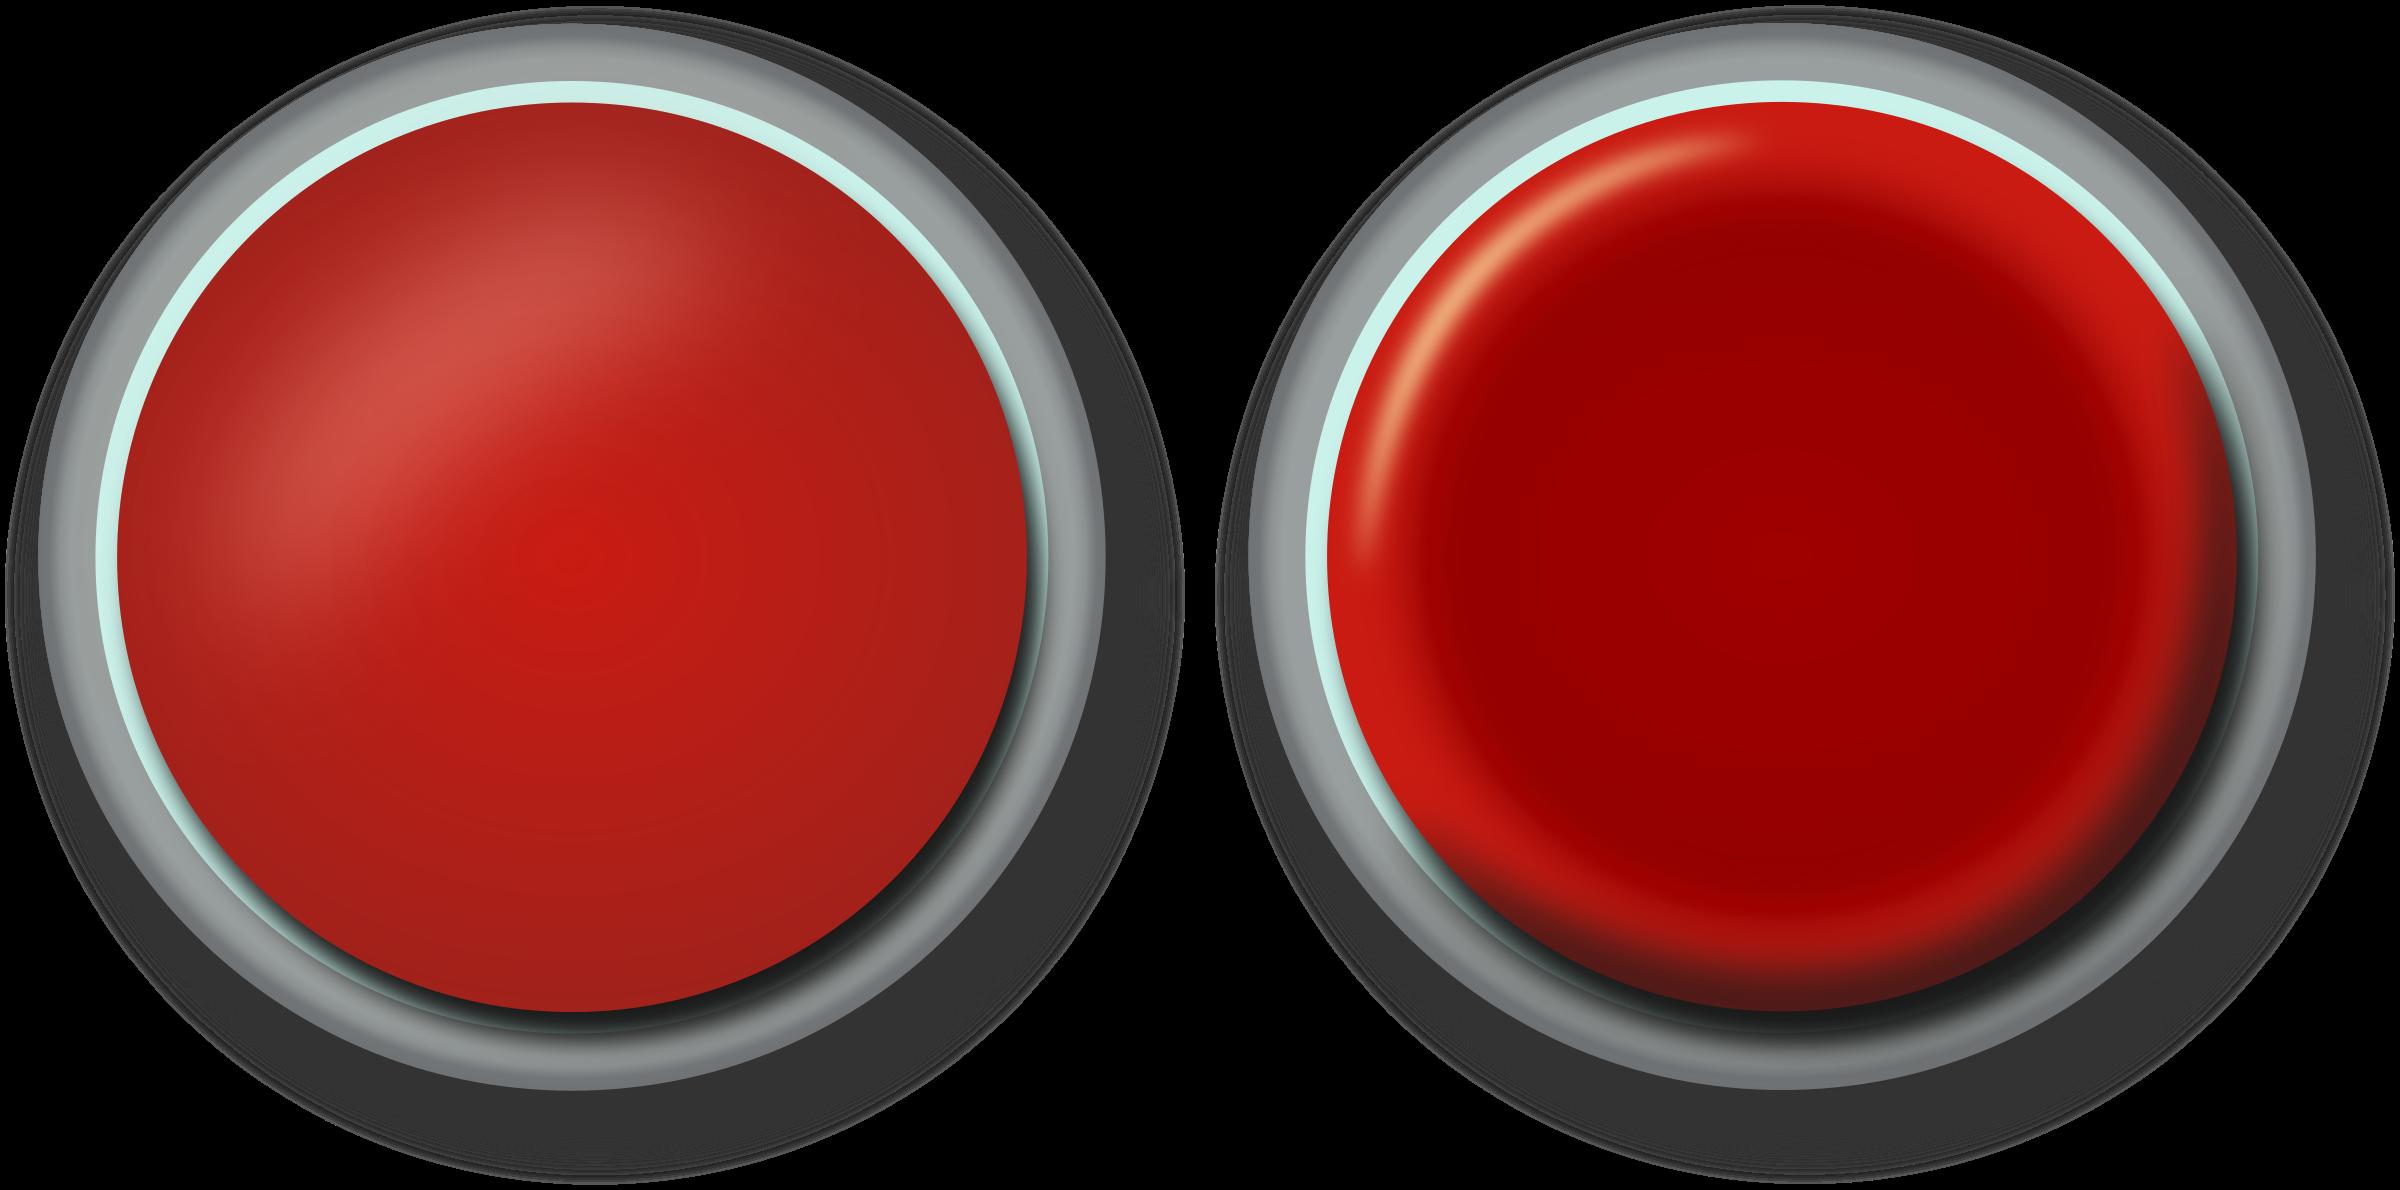 Button clipart press button Red button Clipart Red button